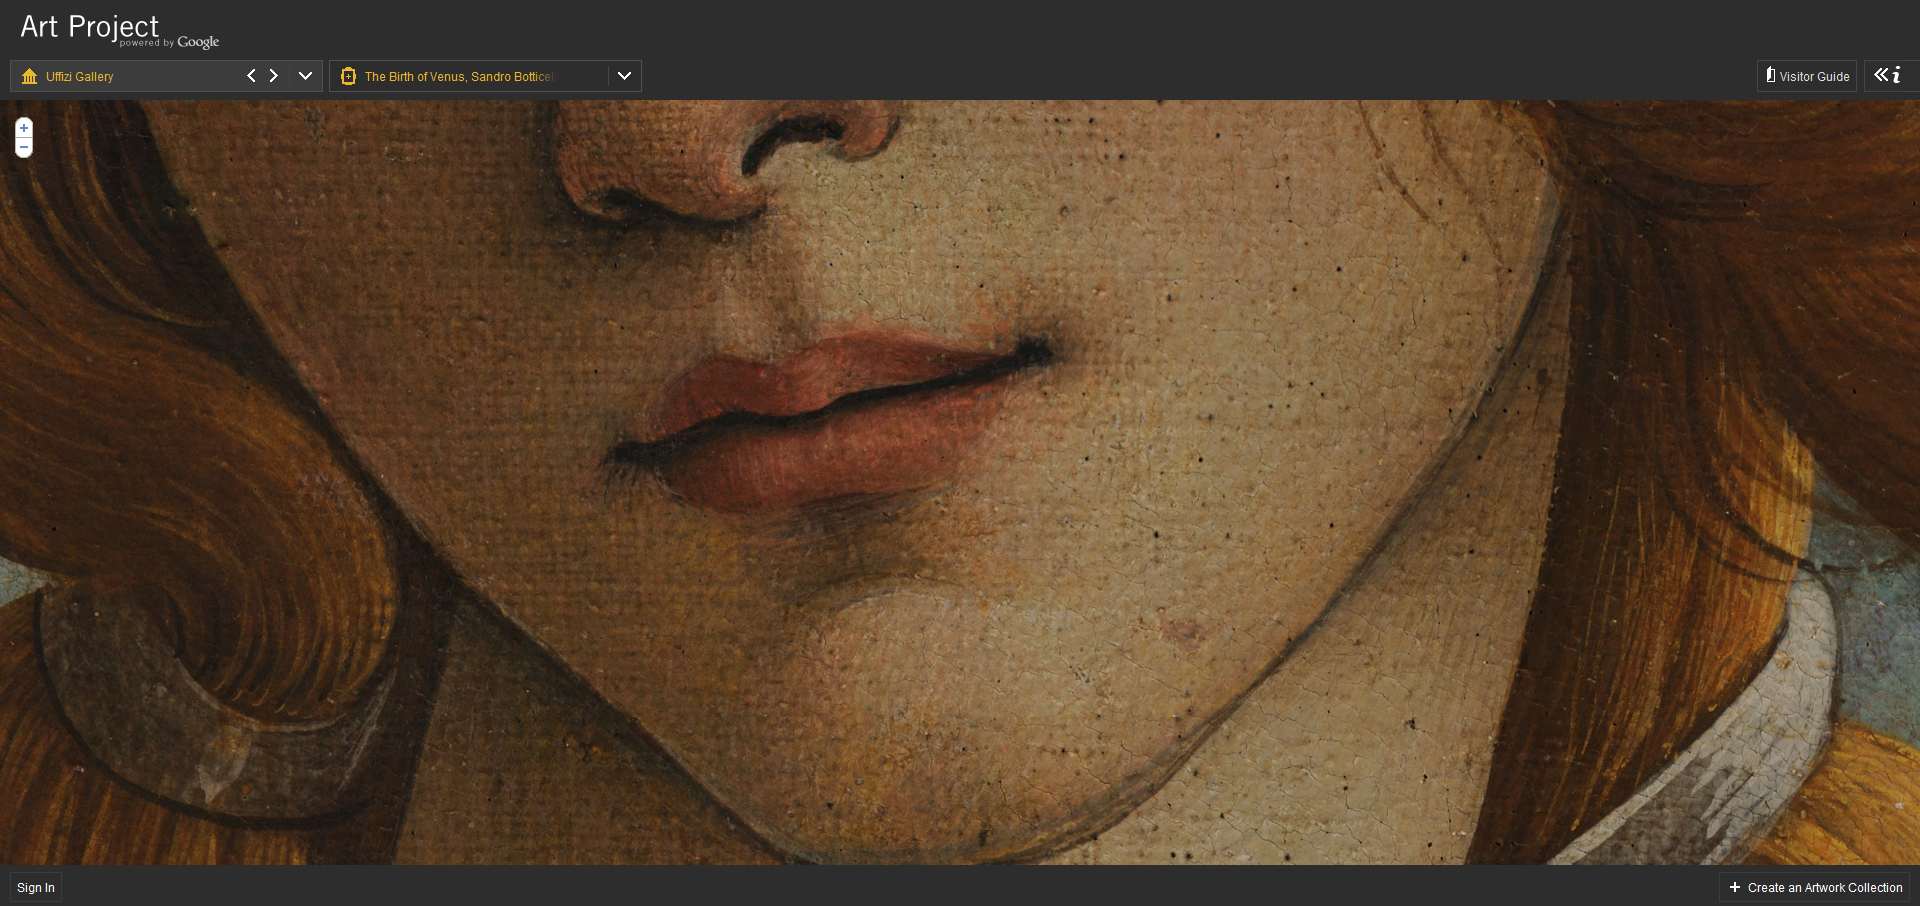 06-Wie_geht-man-mit-Googles-Art-Project-ins_Museum-Venus-Detail-470.png